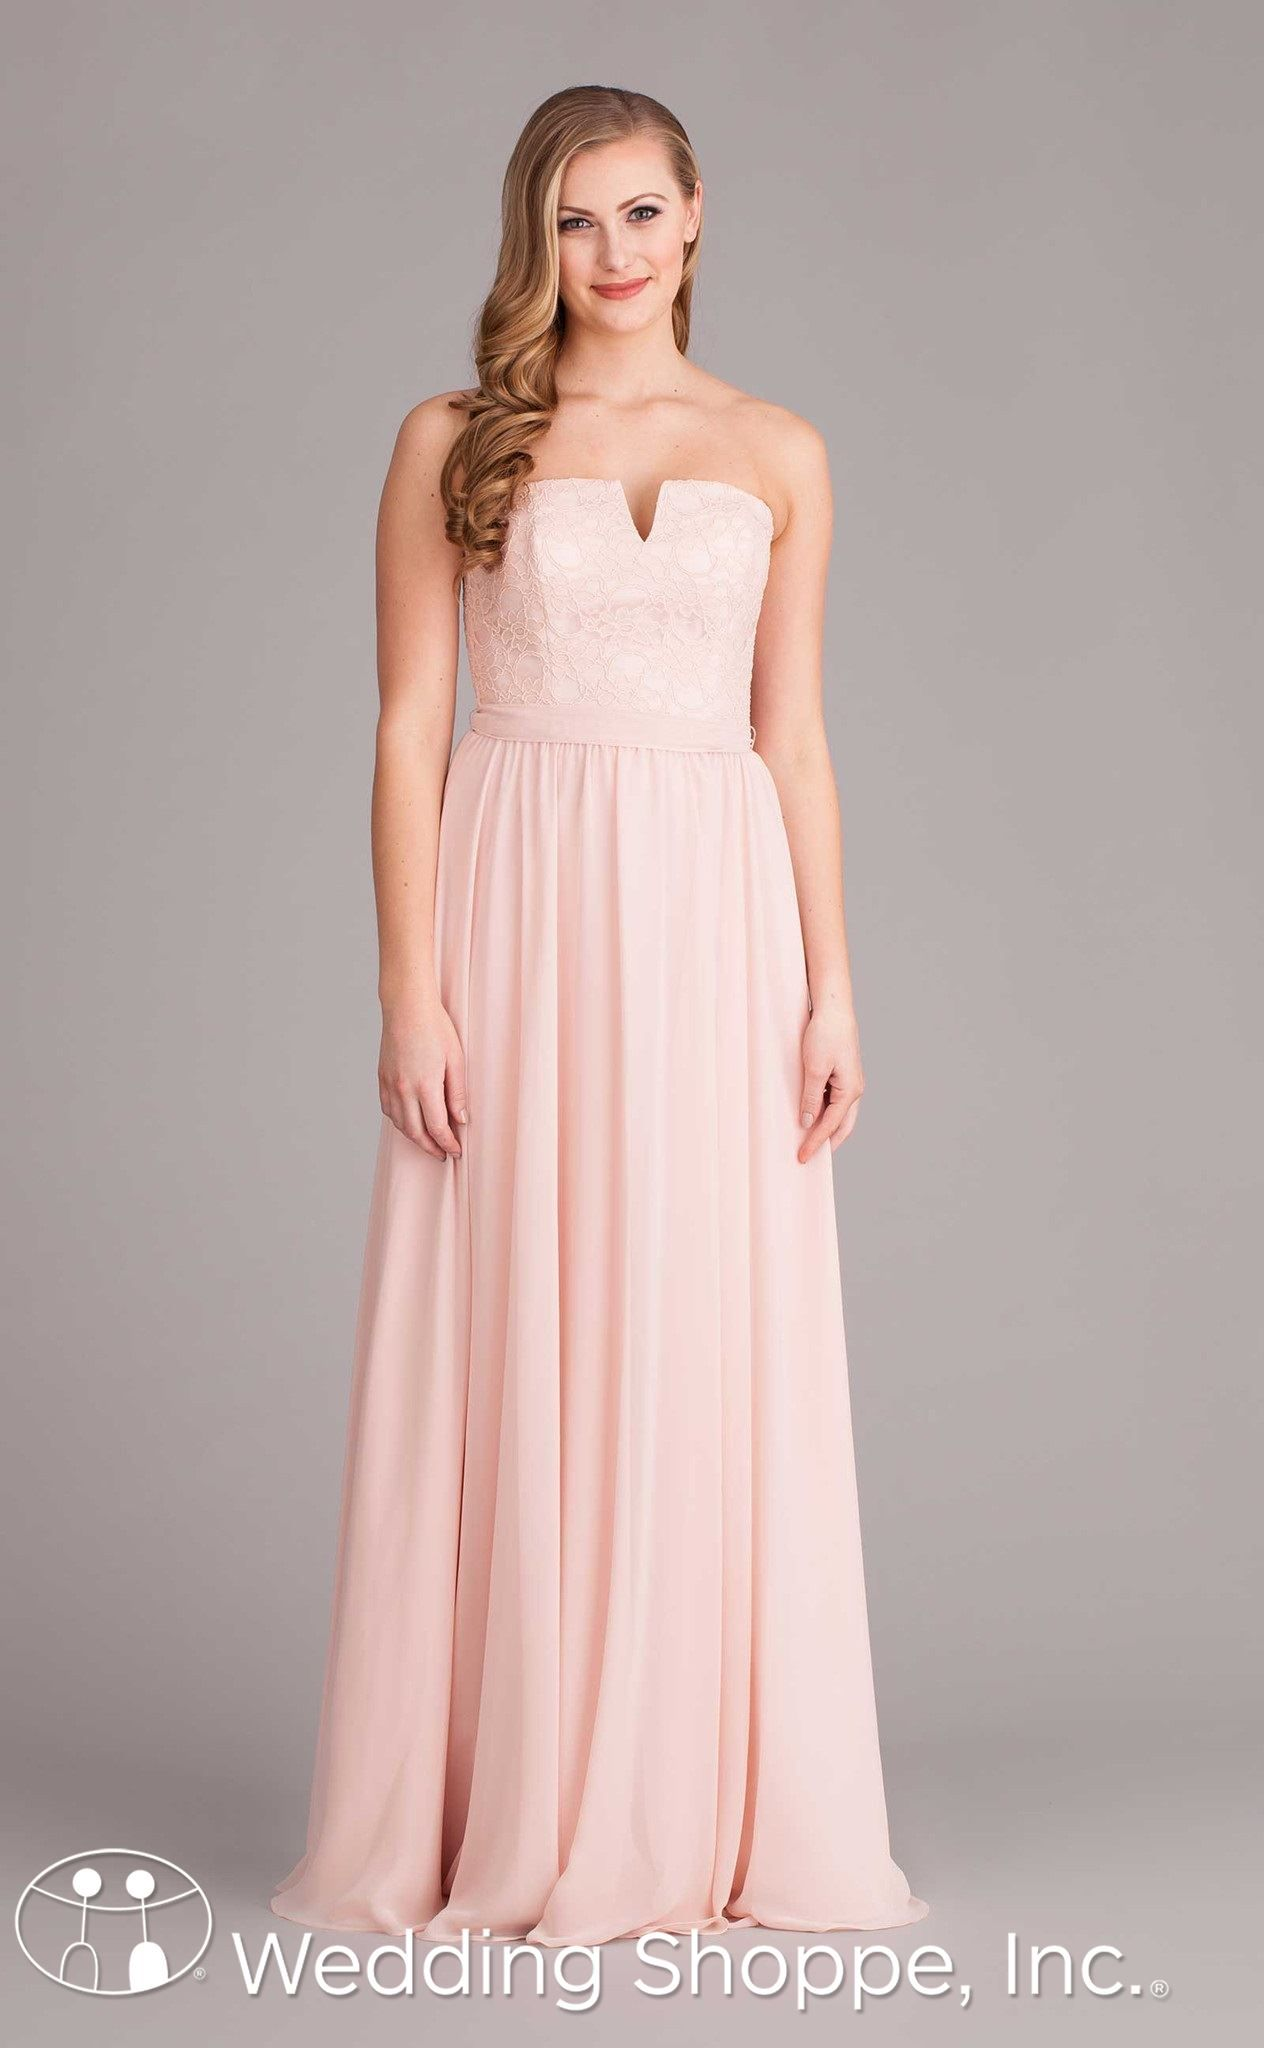 Kennedy blue bridesmaid dress alexa 28206 blushing bride kennedy blue bridesmaid dress alexa 28206 ombrellifo Images